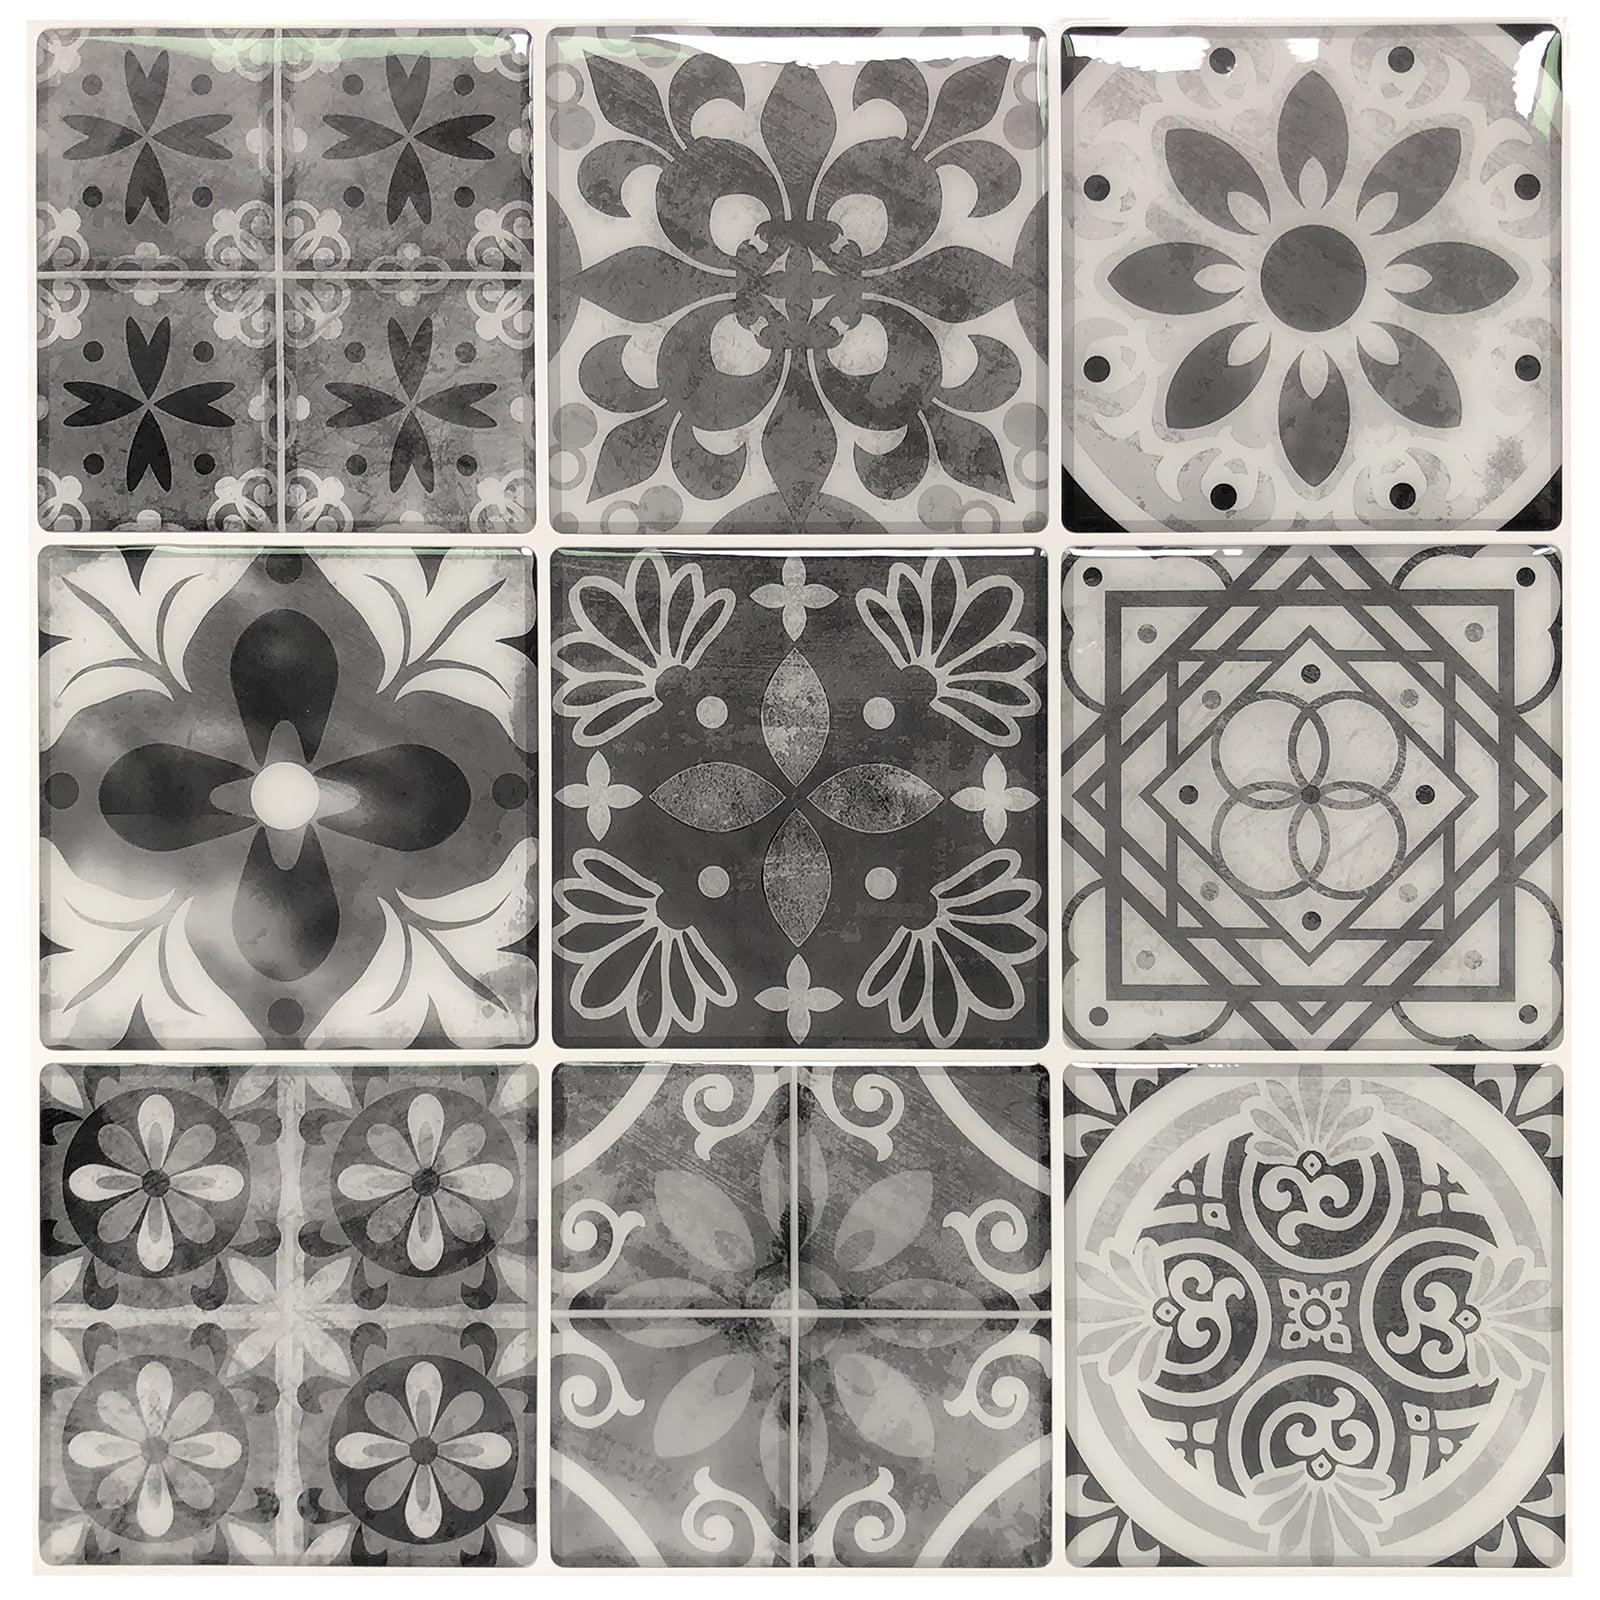 - 10 Sheets Peel And Stick Backsplash Tile Stickers In Gray Talavera Mexican  Tiles - Walmart.com - Walmart.com